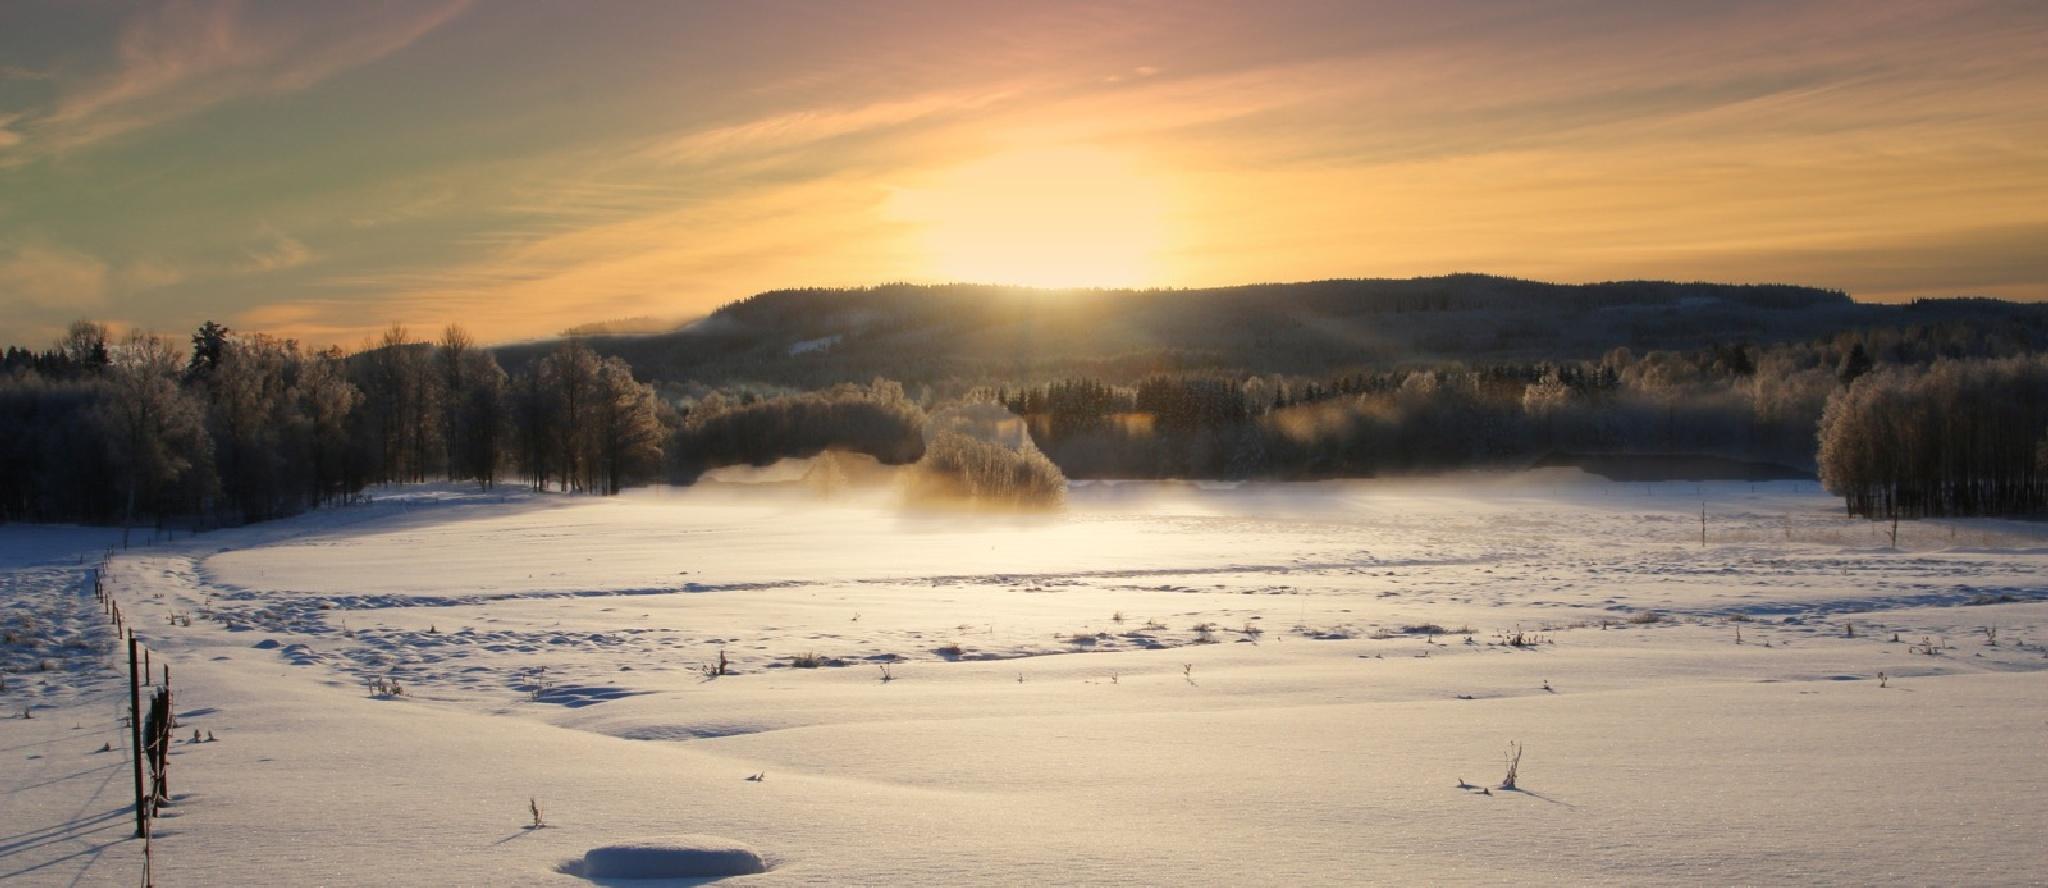 Sonnenuntergang by Mrgit Kluthke